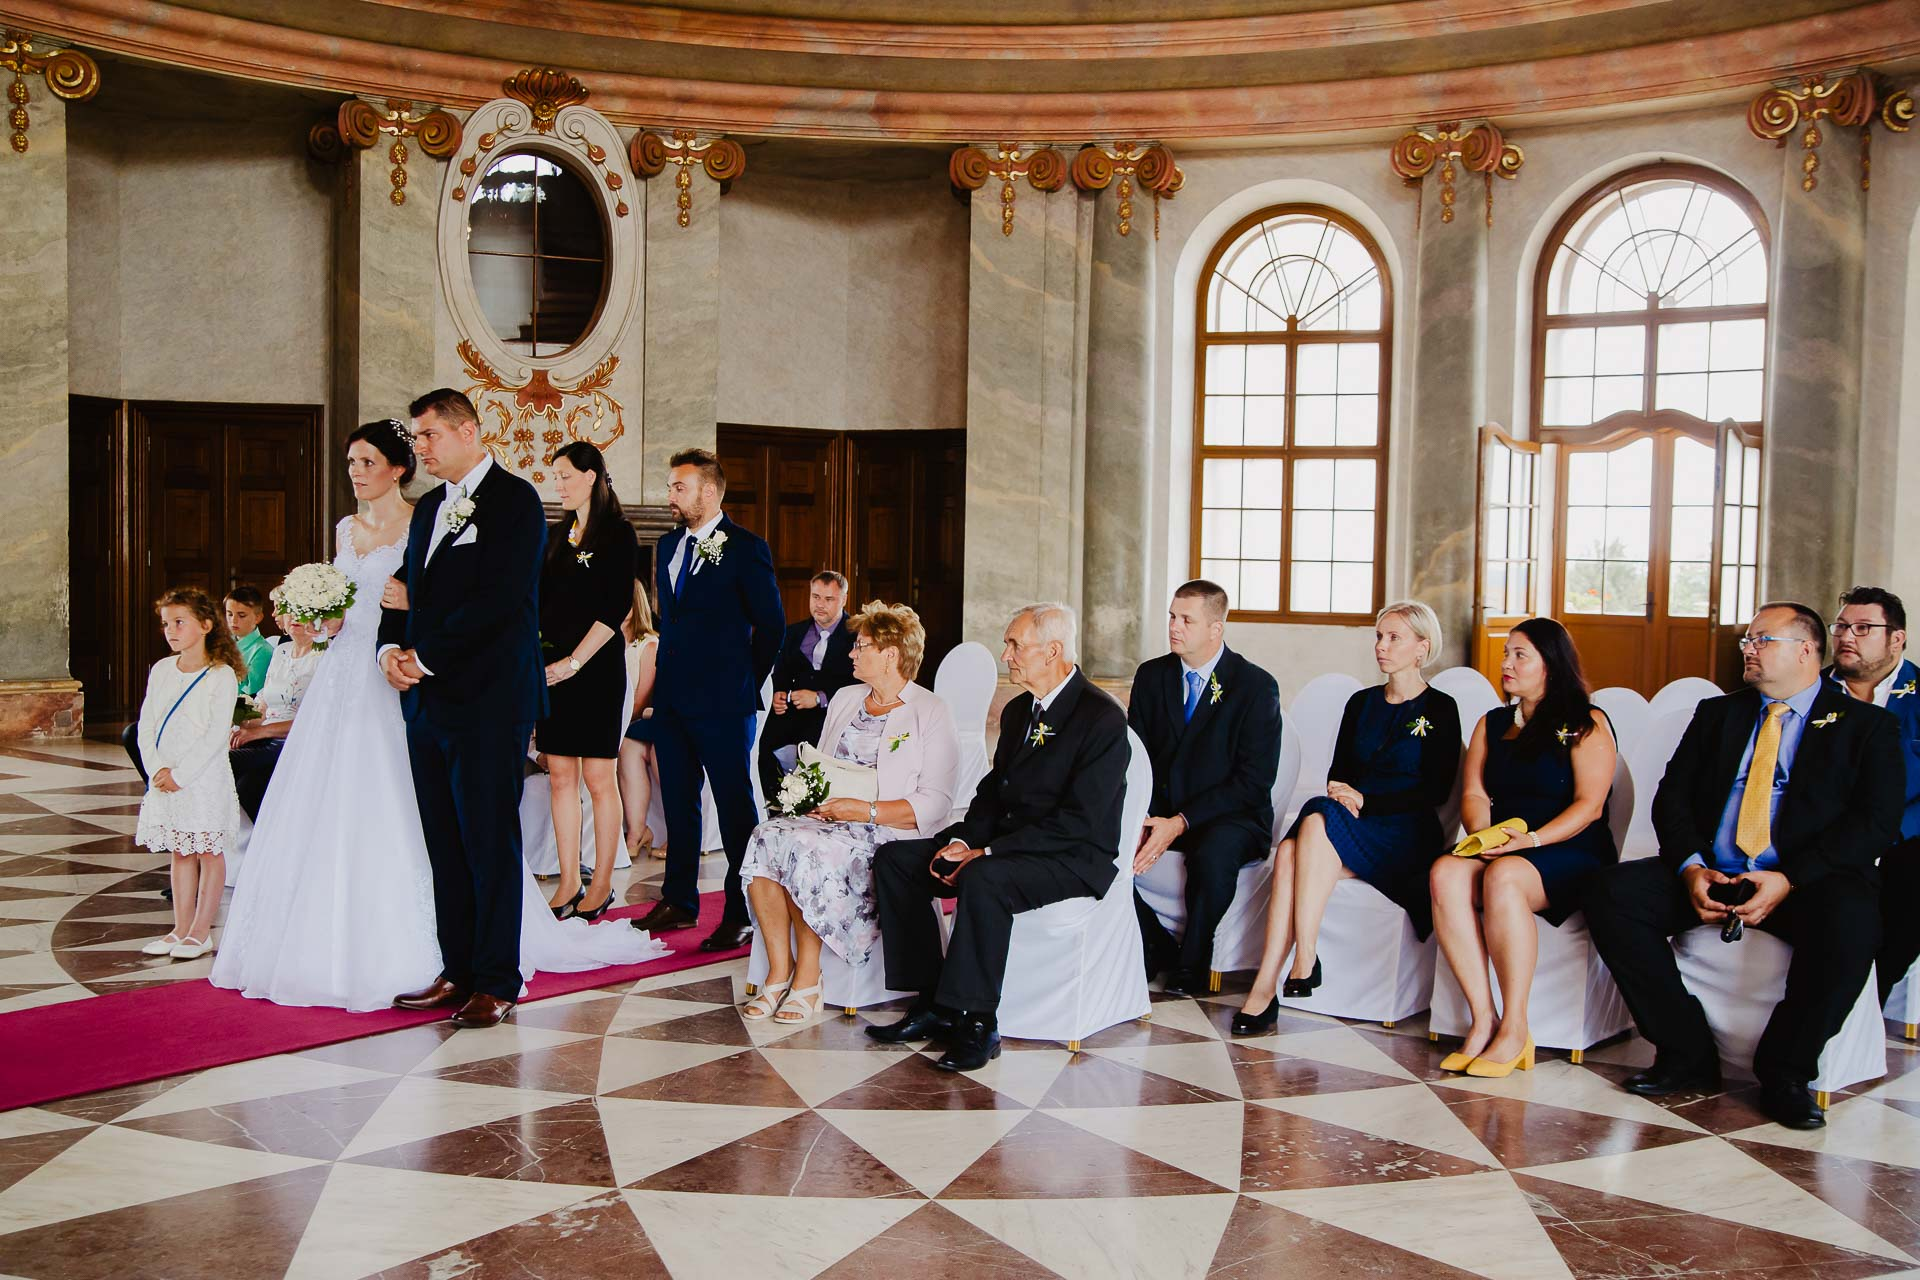 Svatební-fotograf-zámek-Karlova-Koruna-Chlumec-nad-Cidlinou-31